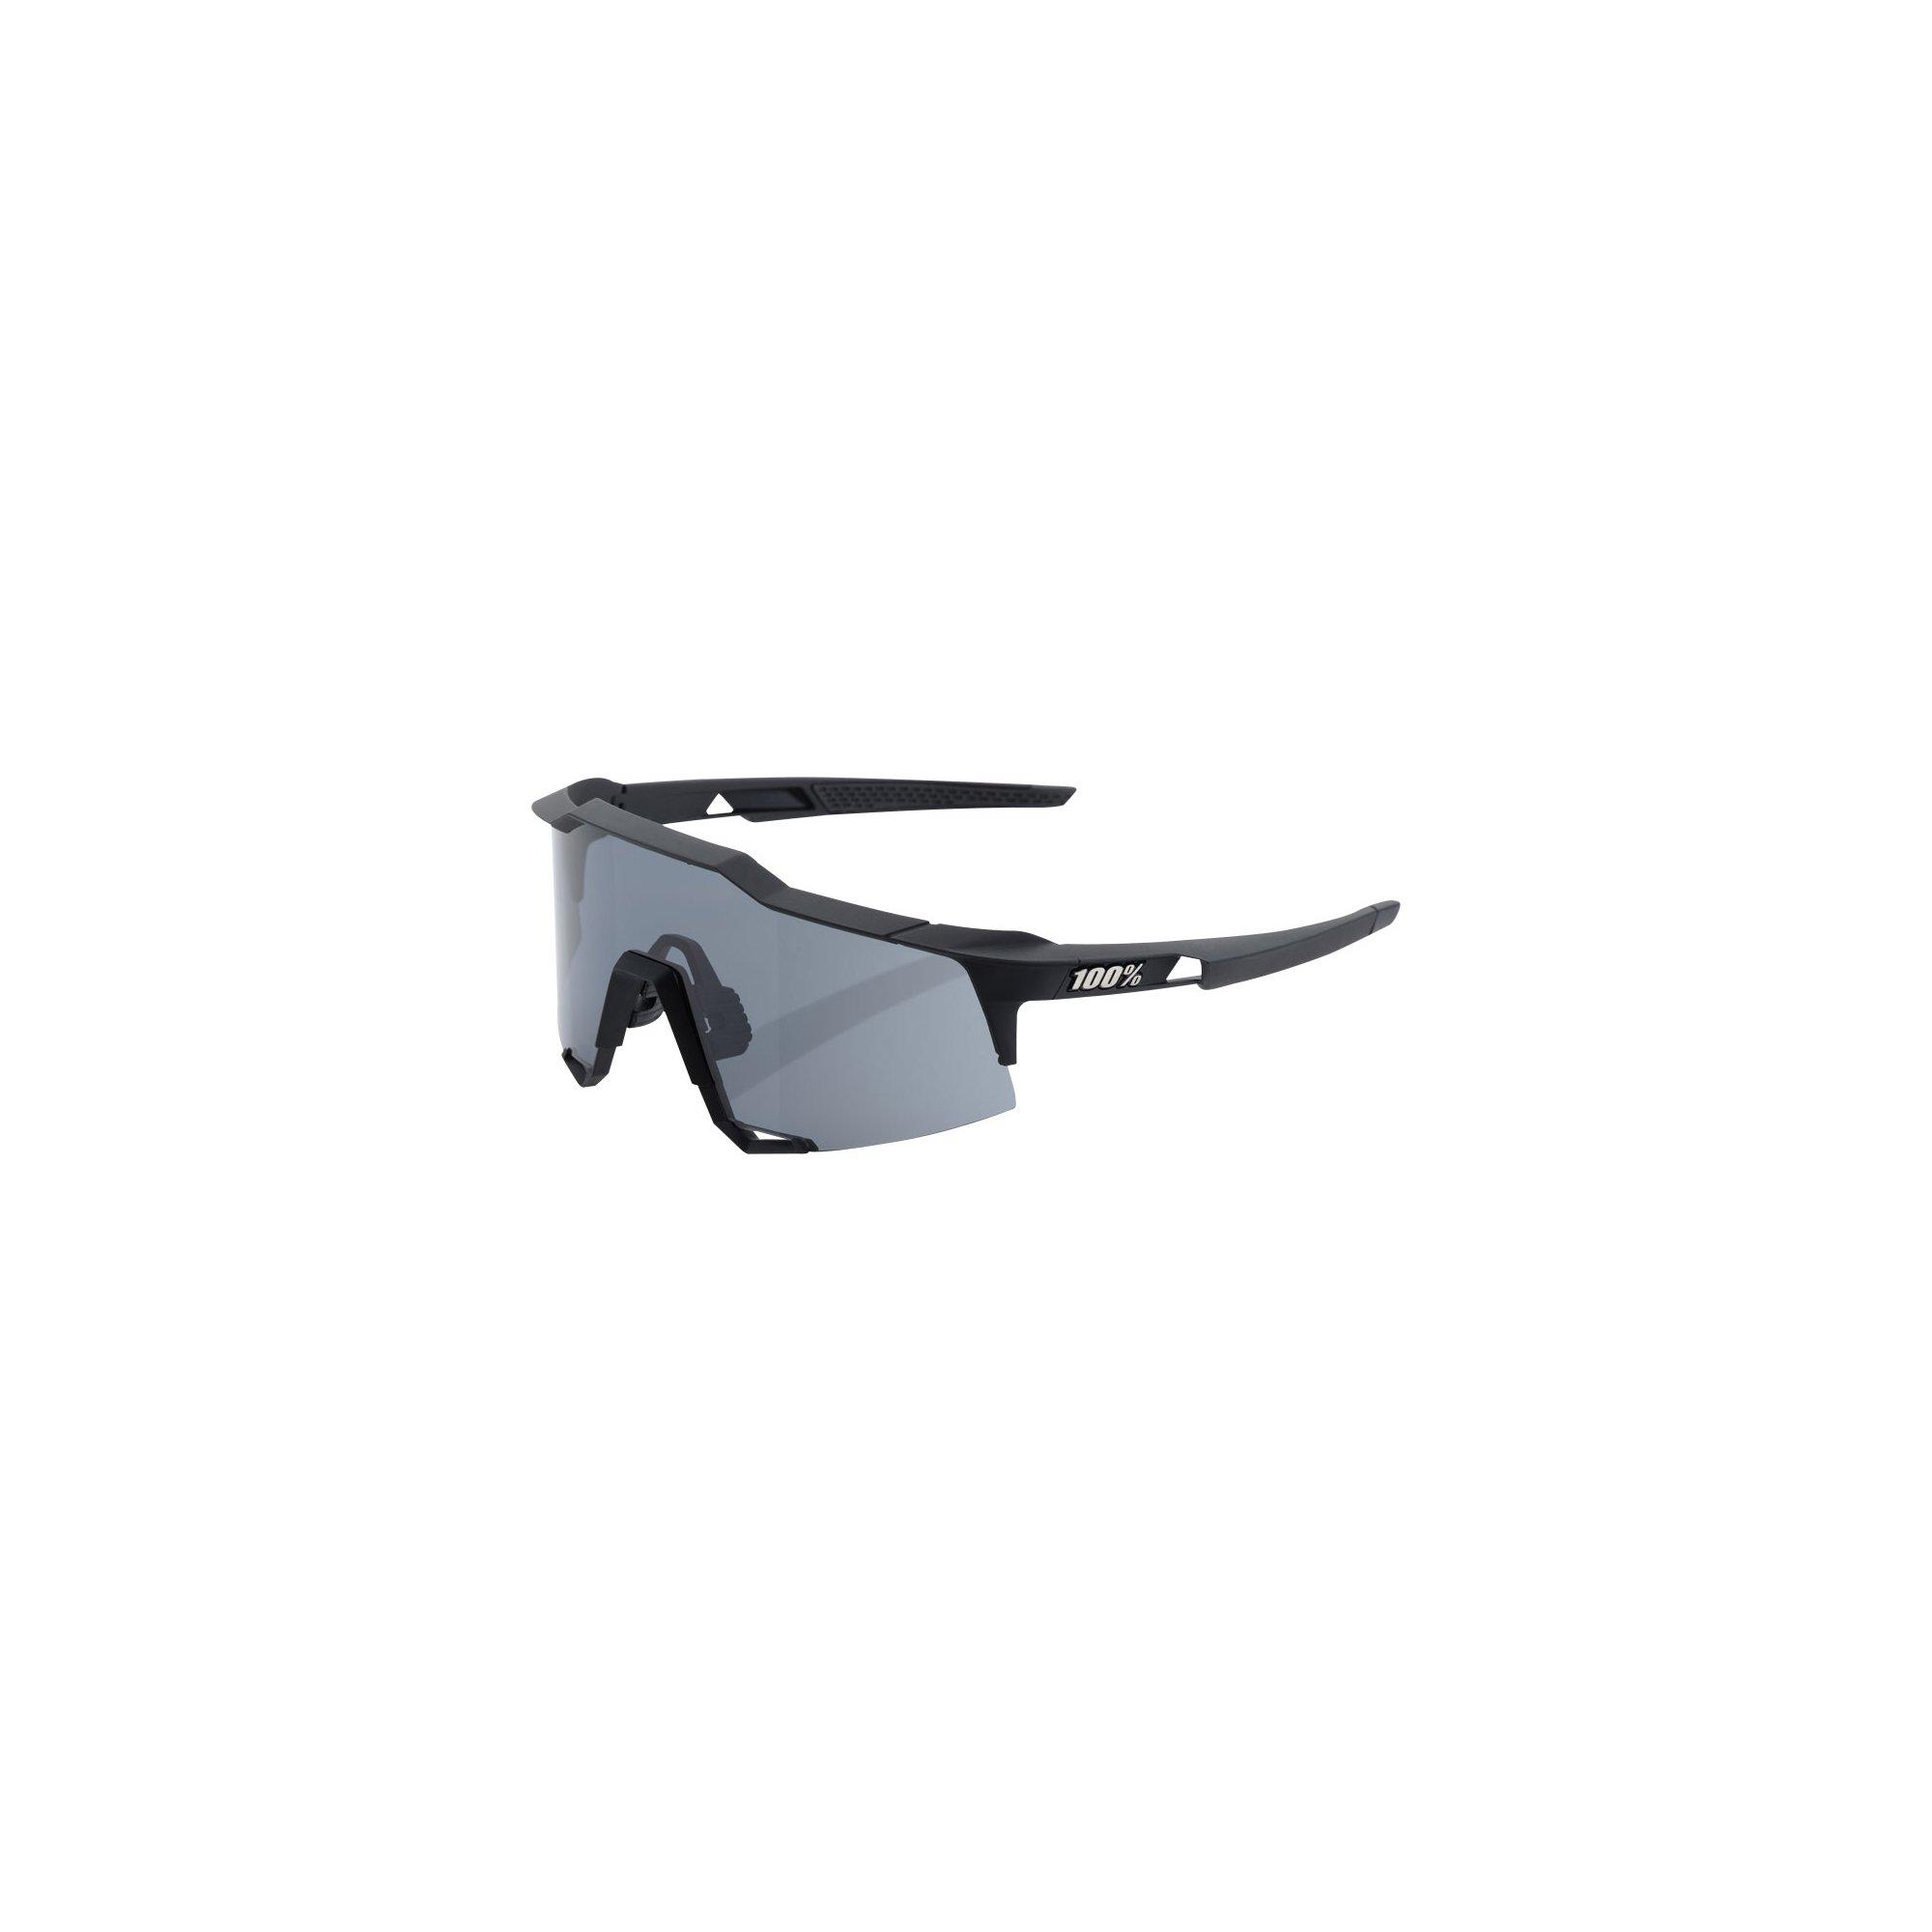 100% Unisex-Adult Speedlab (61001-100-57) Speedcraft-Soft Tact Black-Smoke Lens, Free Size) by 100%